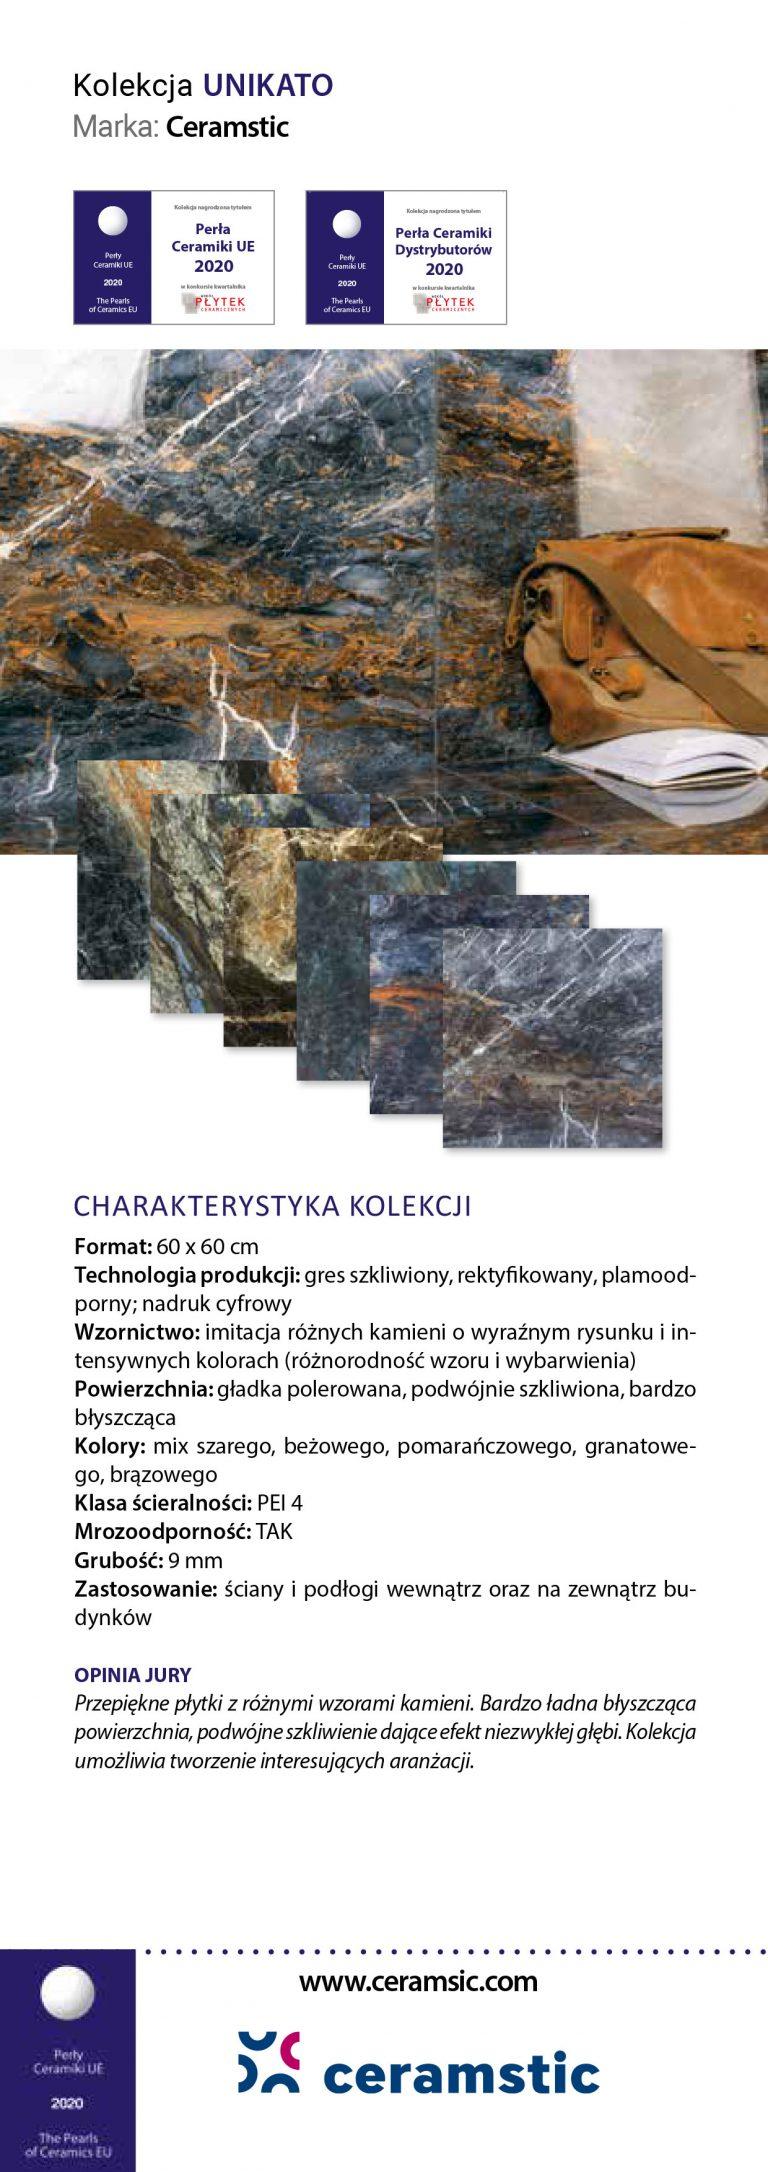 Ceramstic Unikato Perły Ceramiki 2020